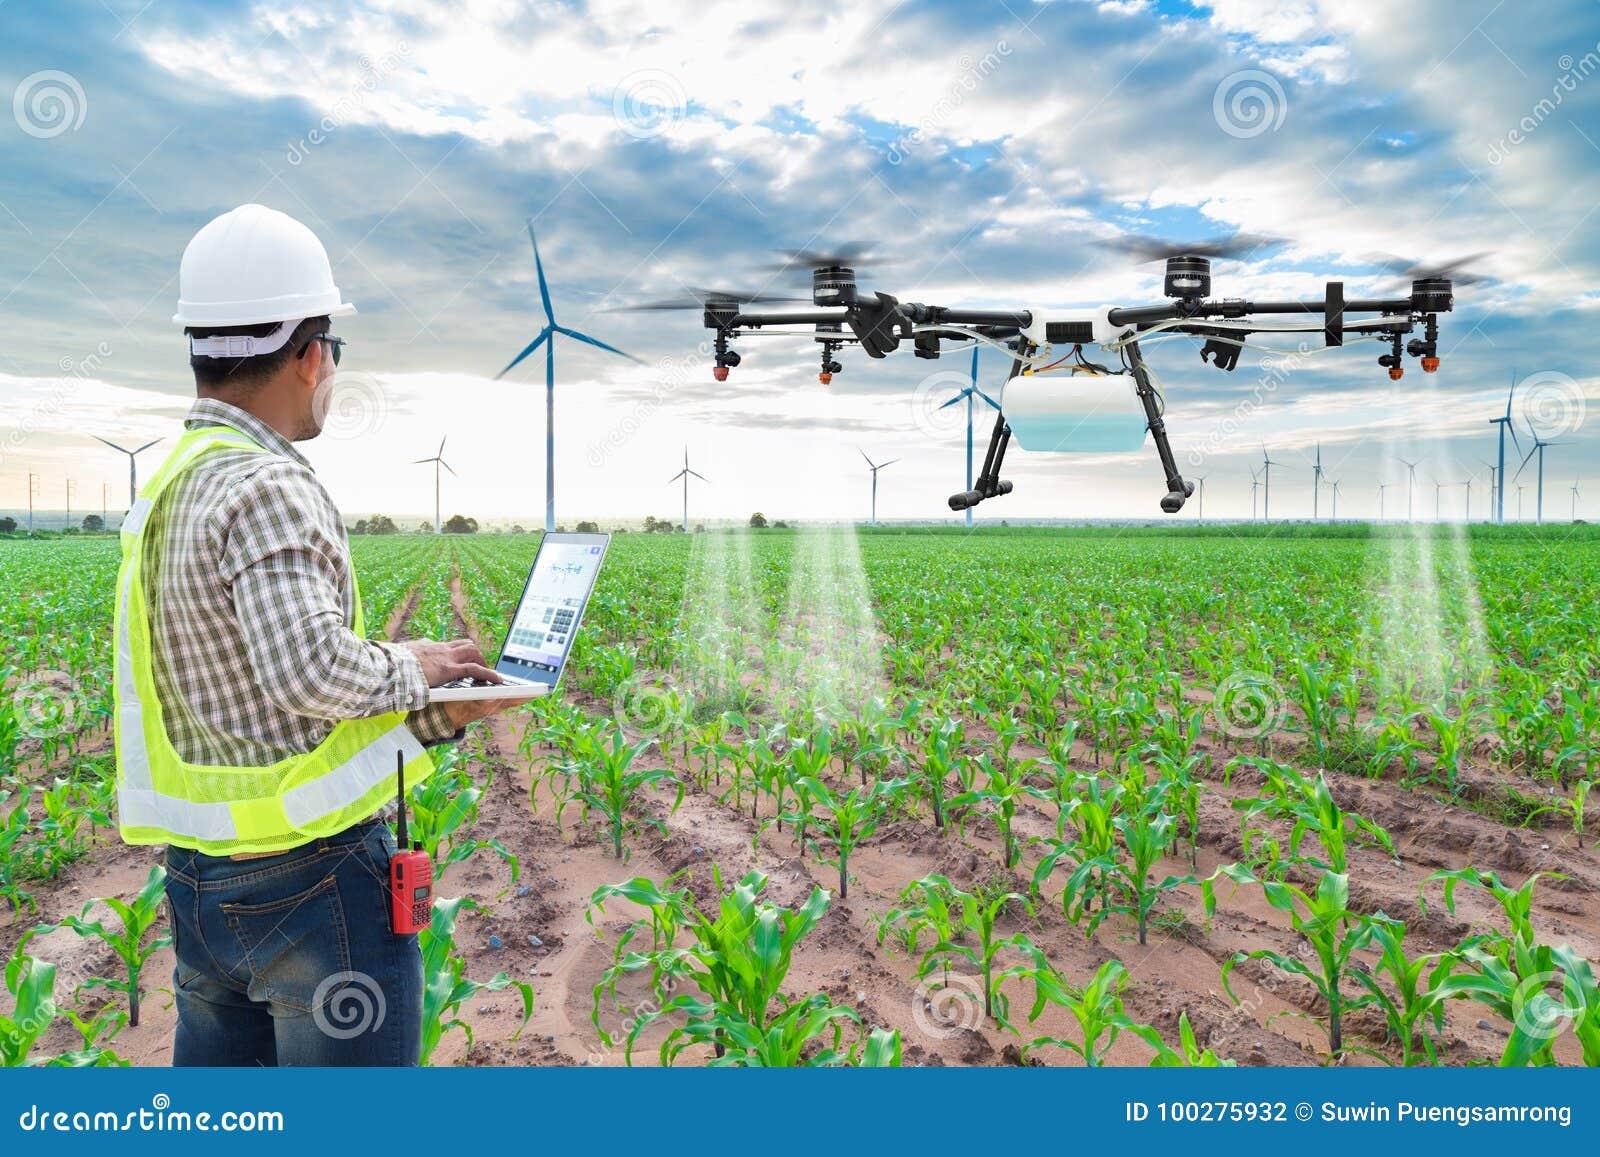 Technician farmer use wifi computer control agriculture drone